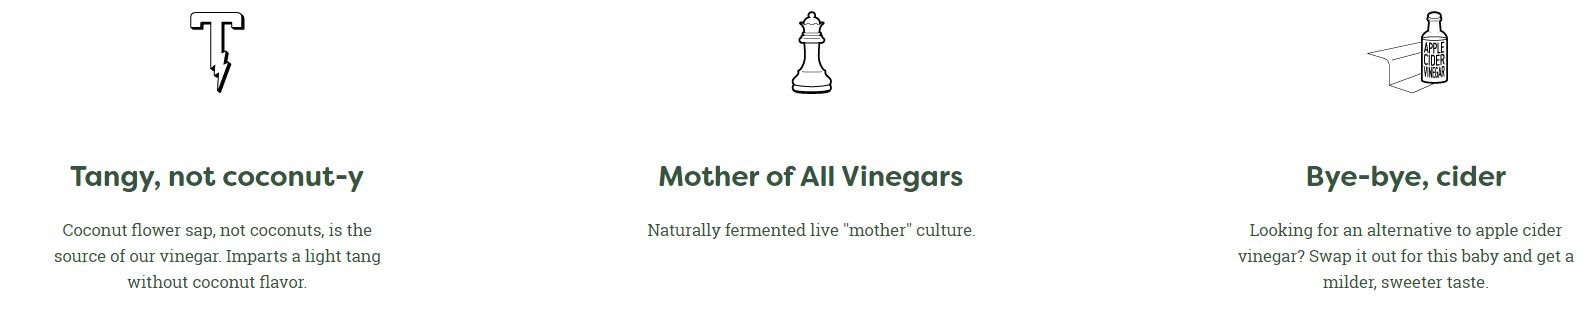 BetterBody Foods Organic Coconut Vinegar, 16.9 oz